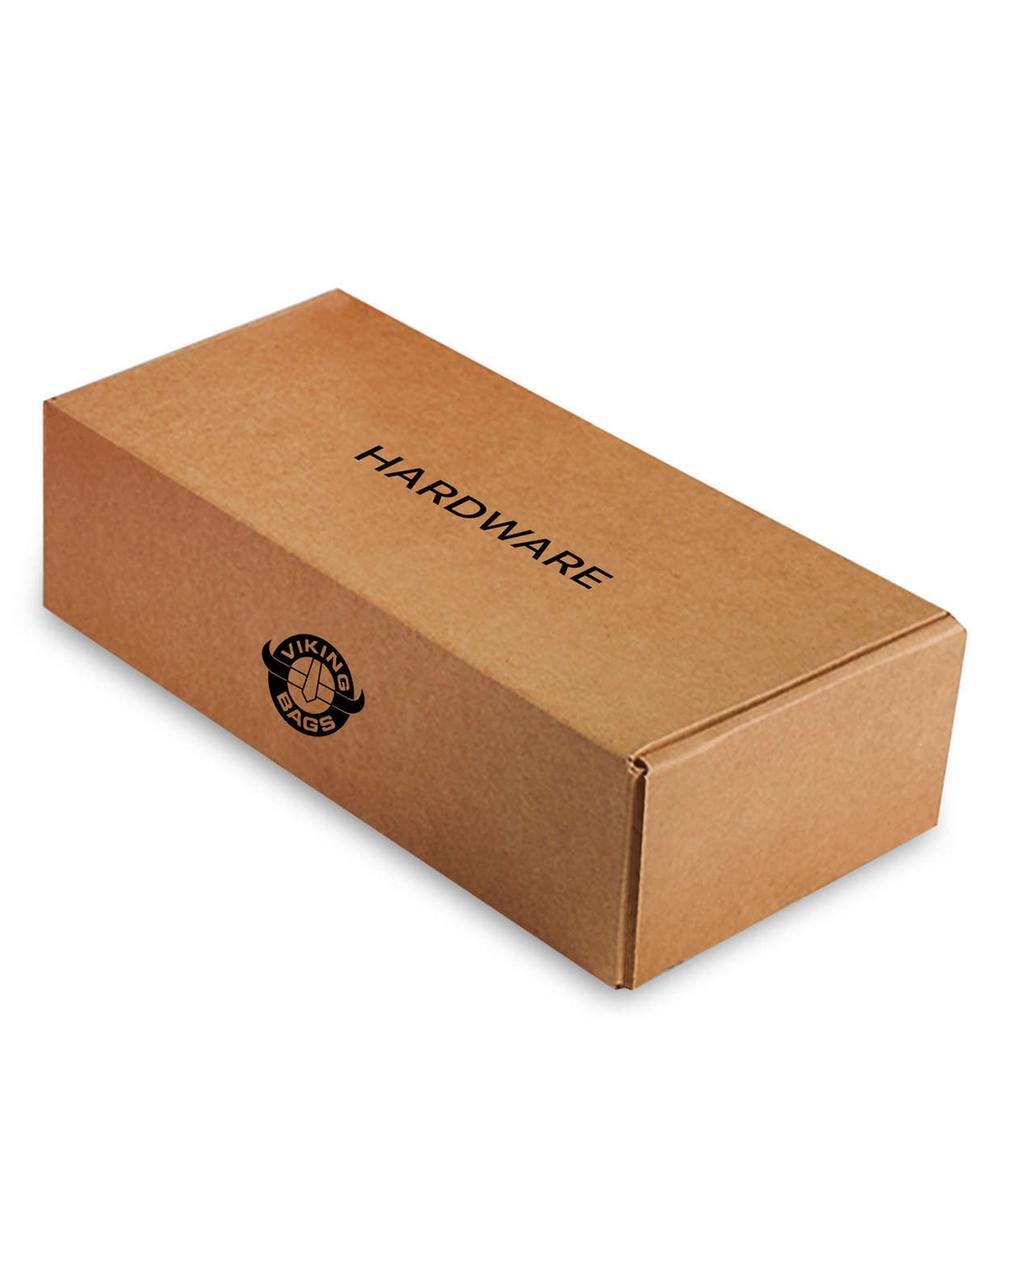 Honda VTX 1300 C Shock Cutout Motorcycle Saddlebags Hardware Box